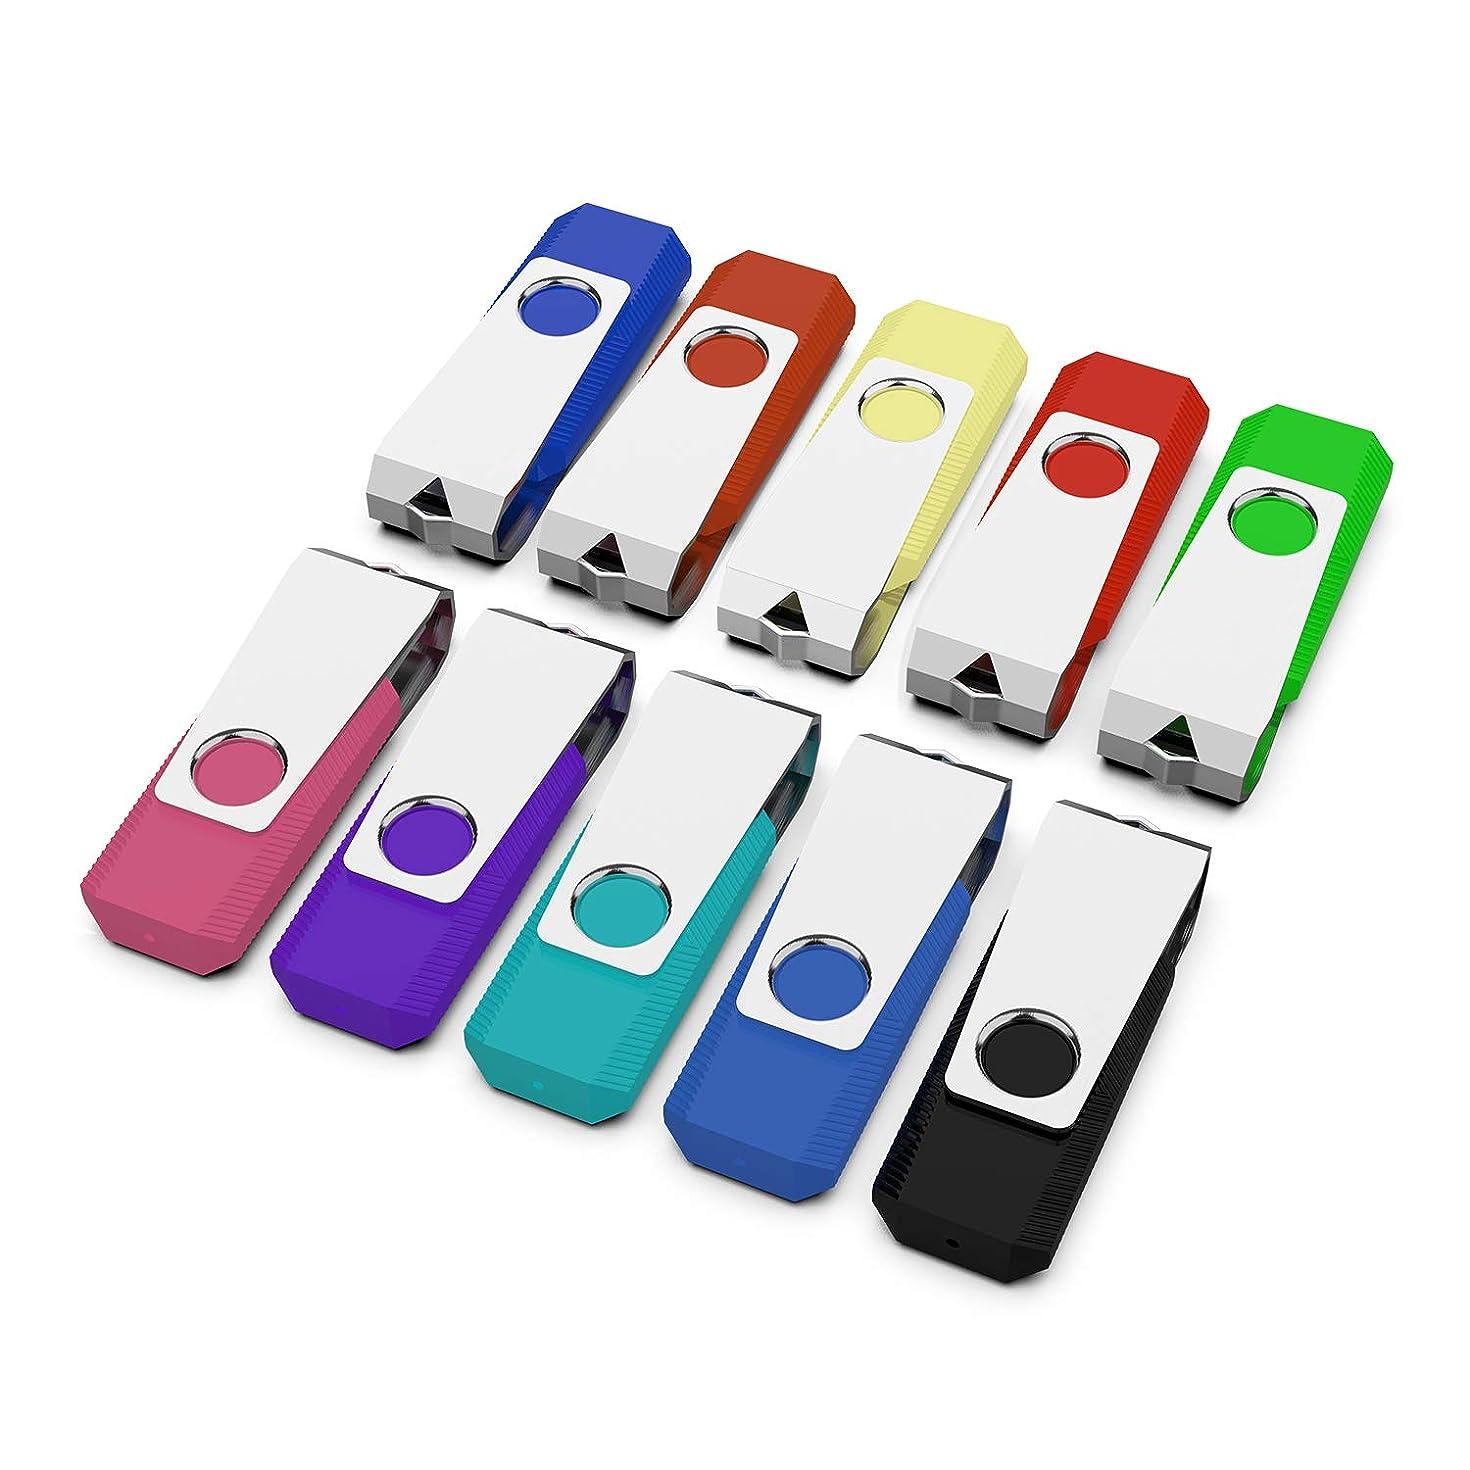 KEXIN USB Drive Bulk 10 Pack 32GB USB Flash Drive Thumb Drive Flash Drives Swivel Design USB 2.0 Color (32GB10PCS)